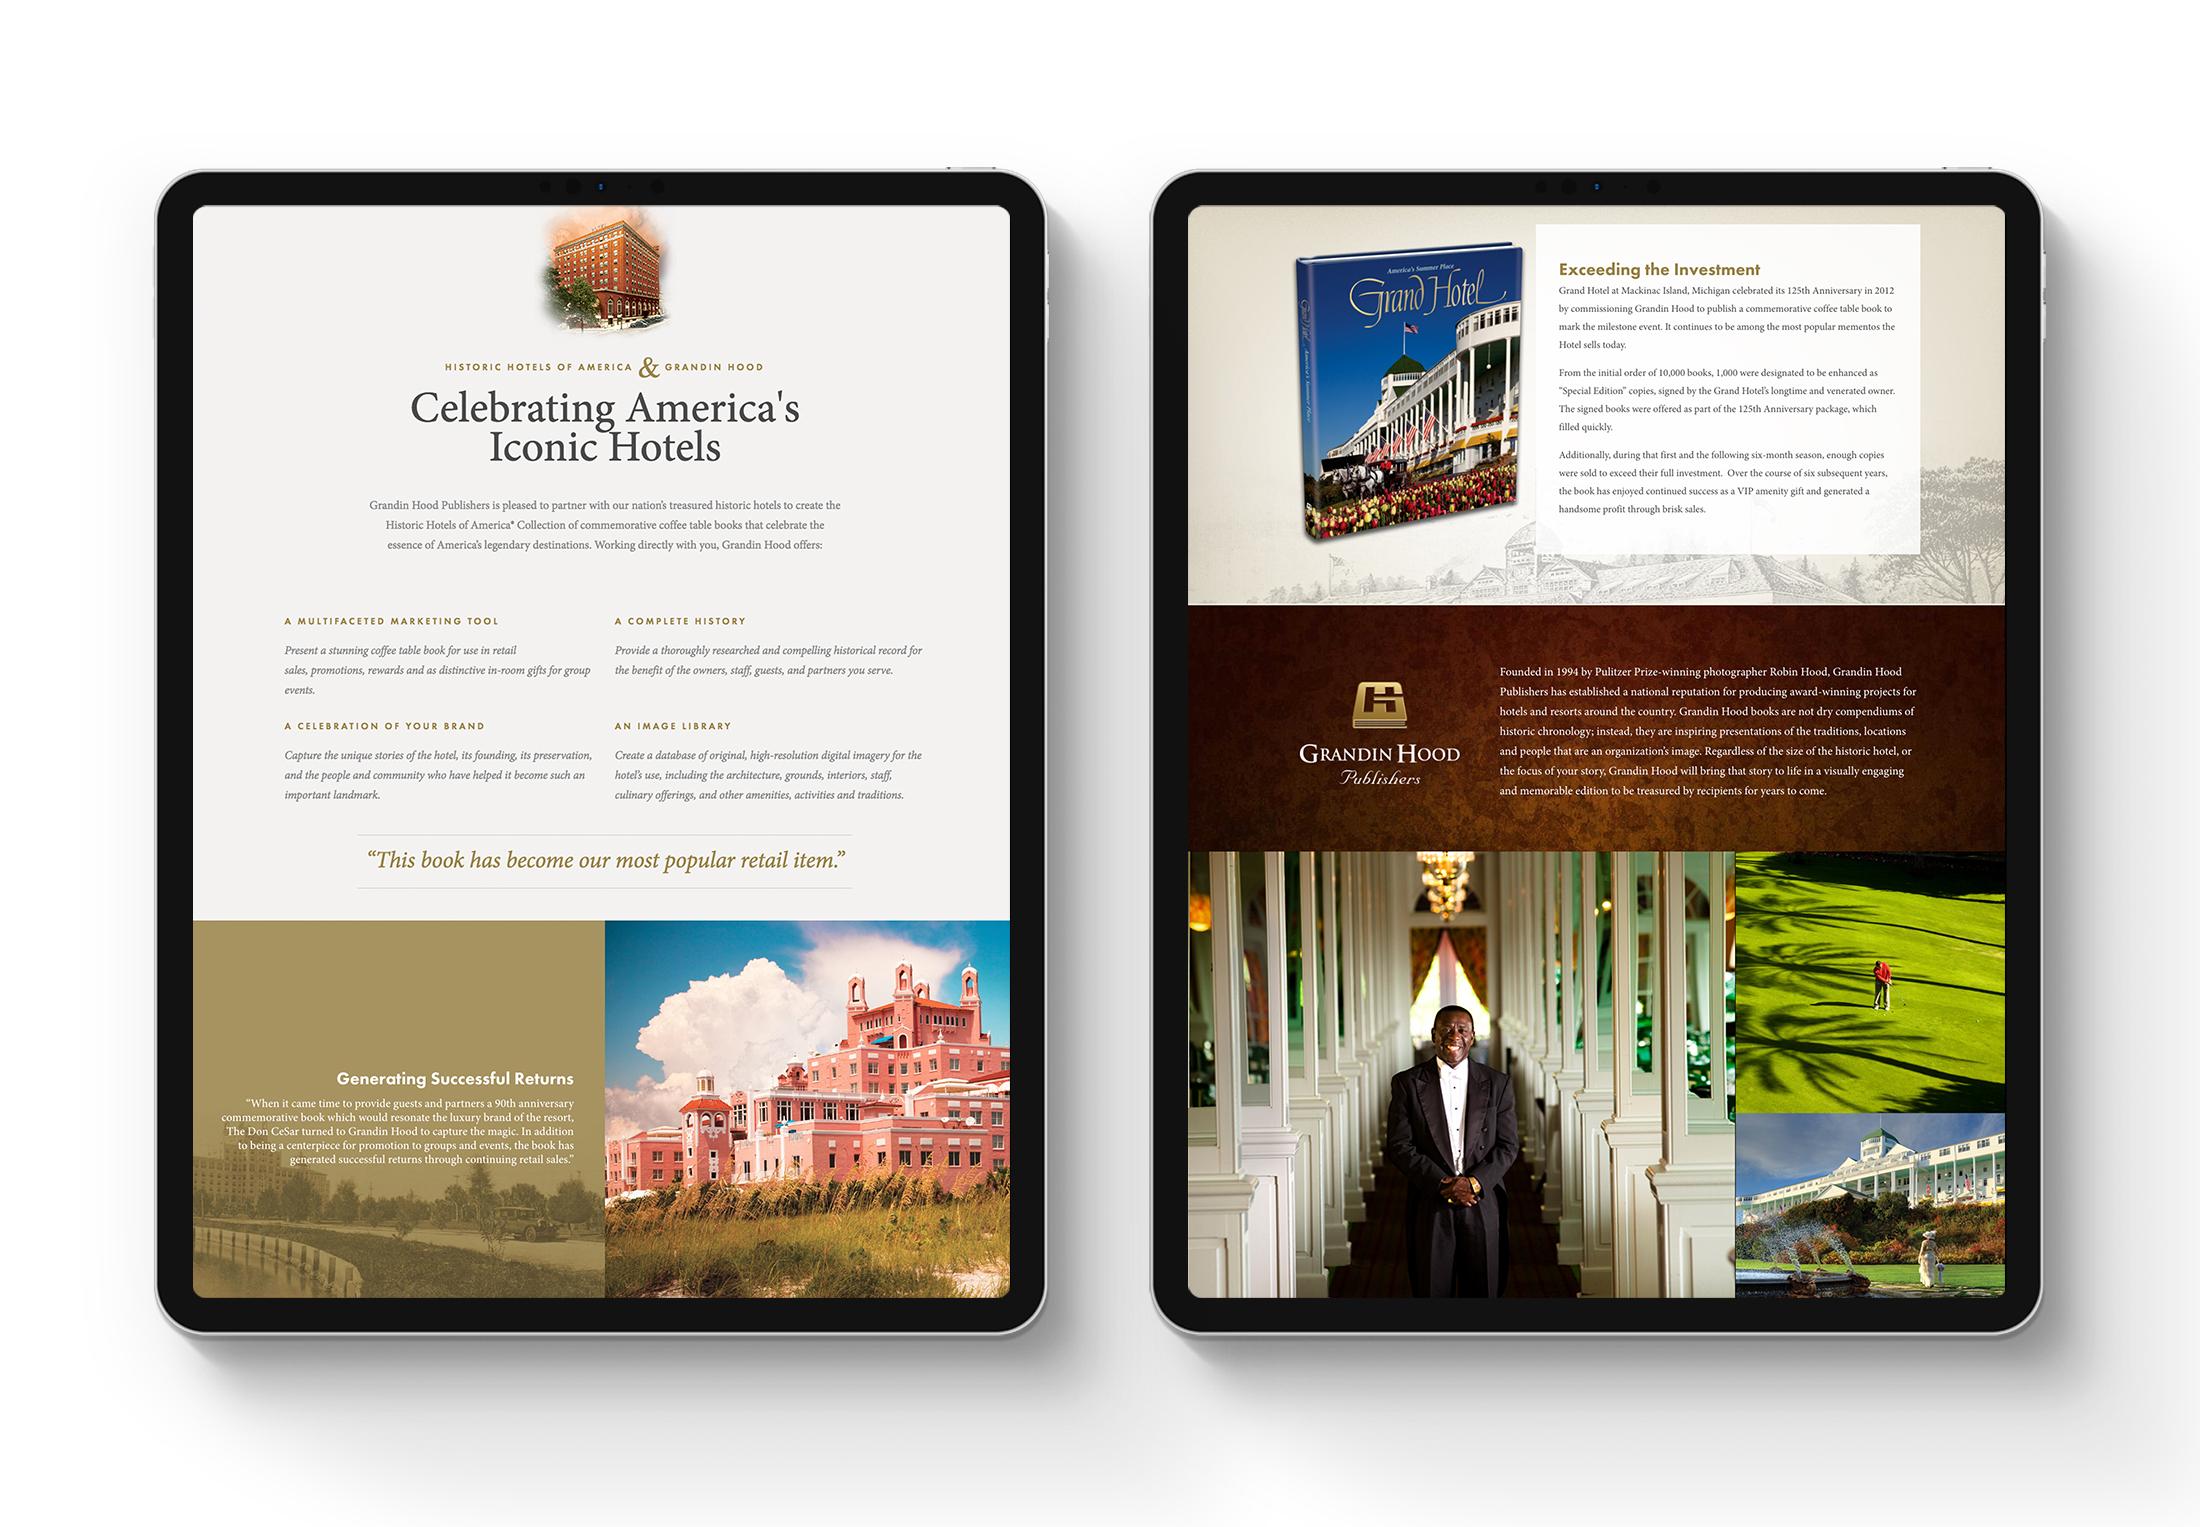 Grandin Hood web design © Robertson Design